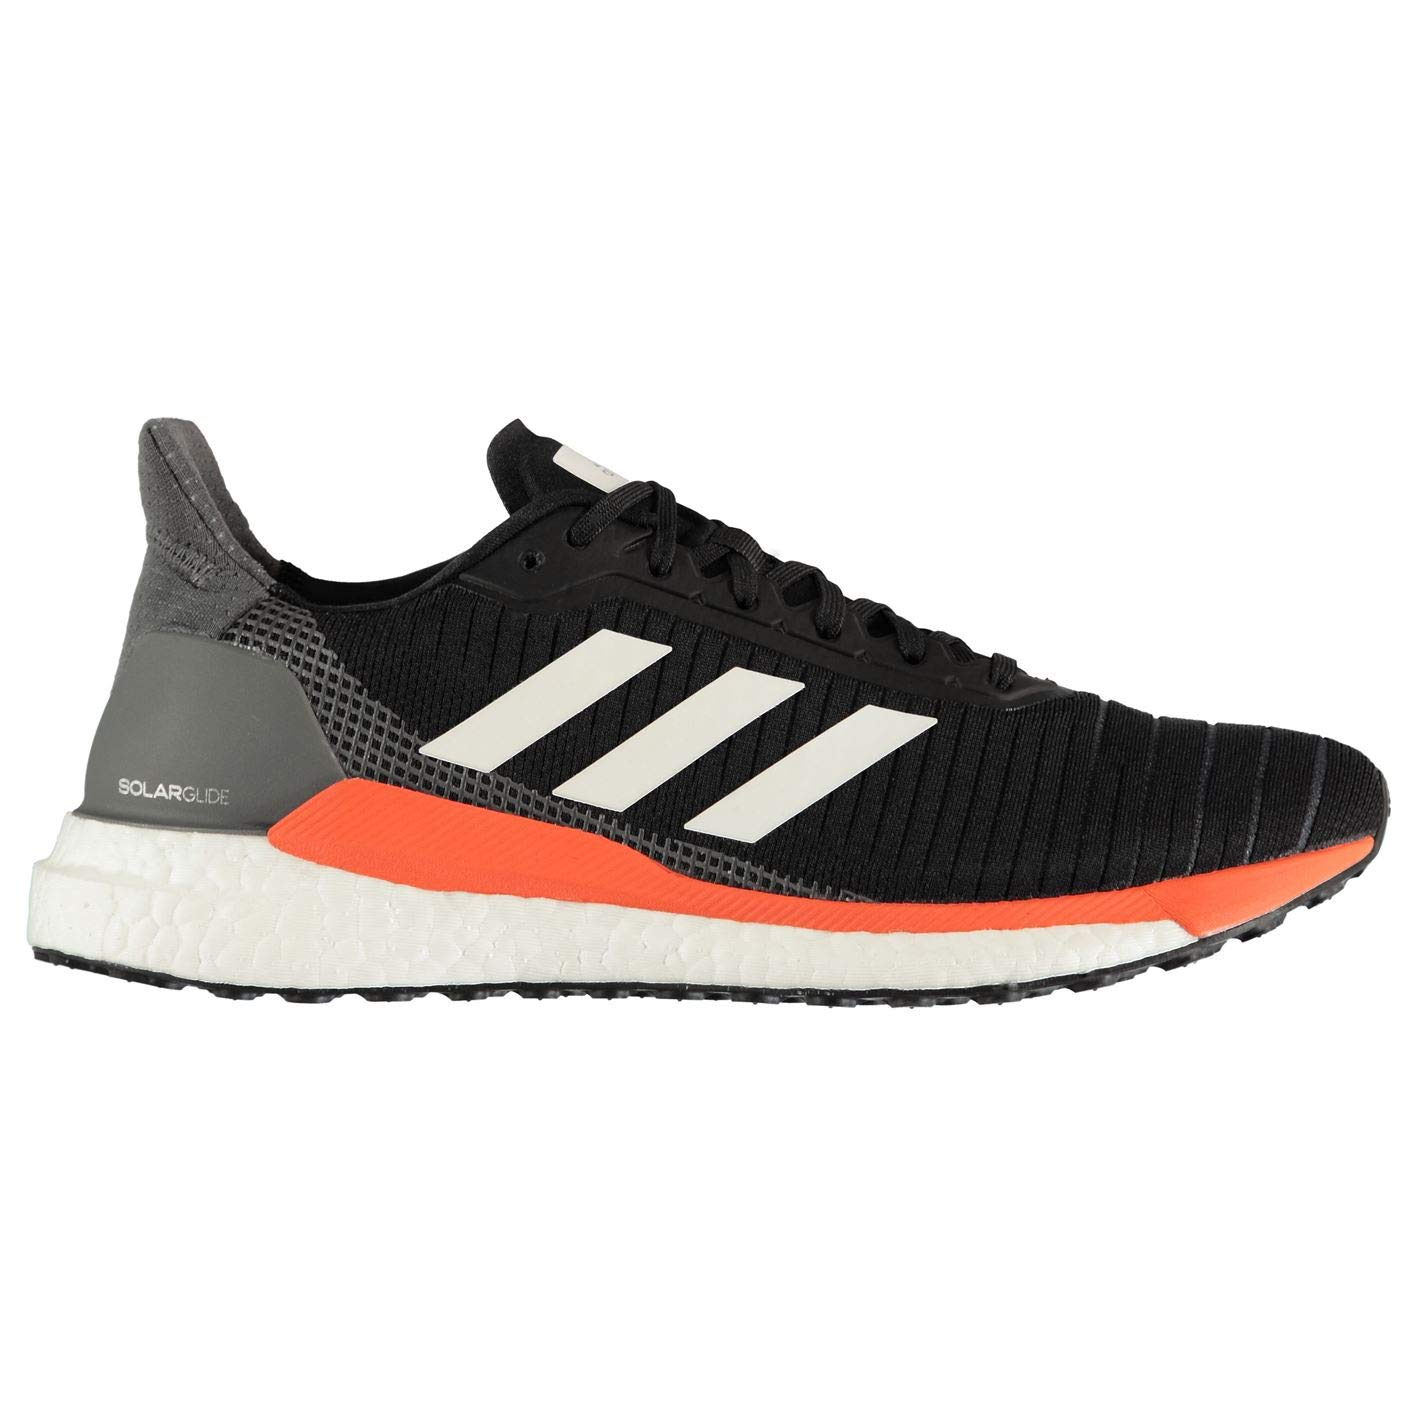 Adidas zapatos Solar Glide 19 -